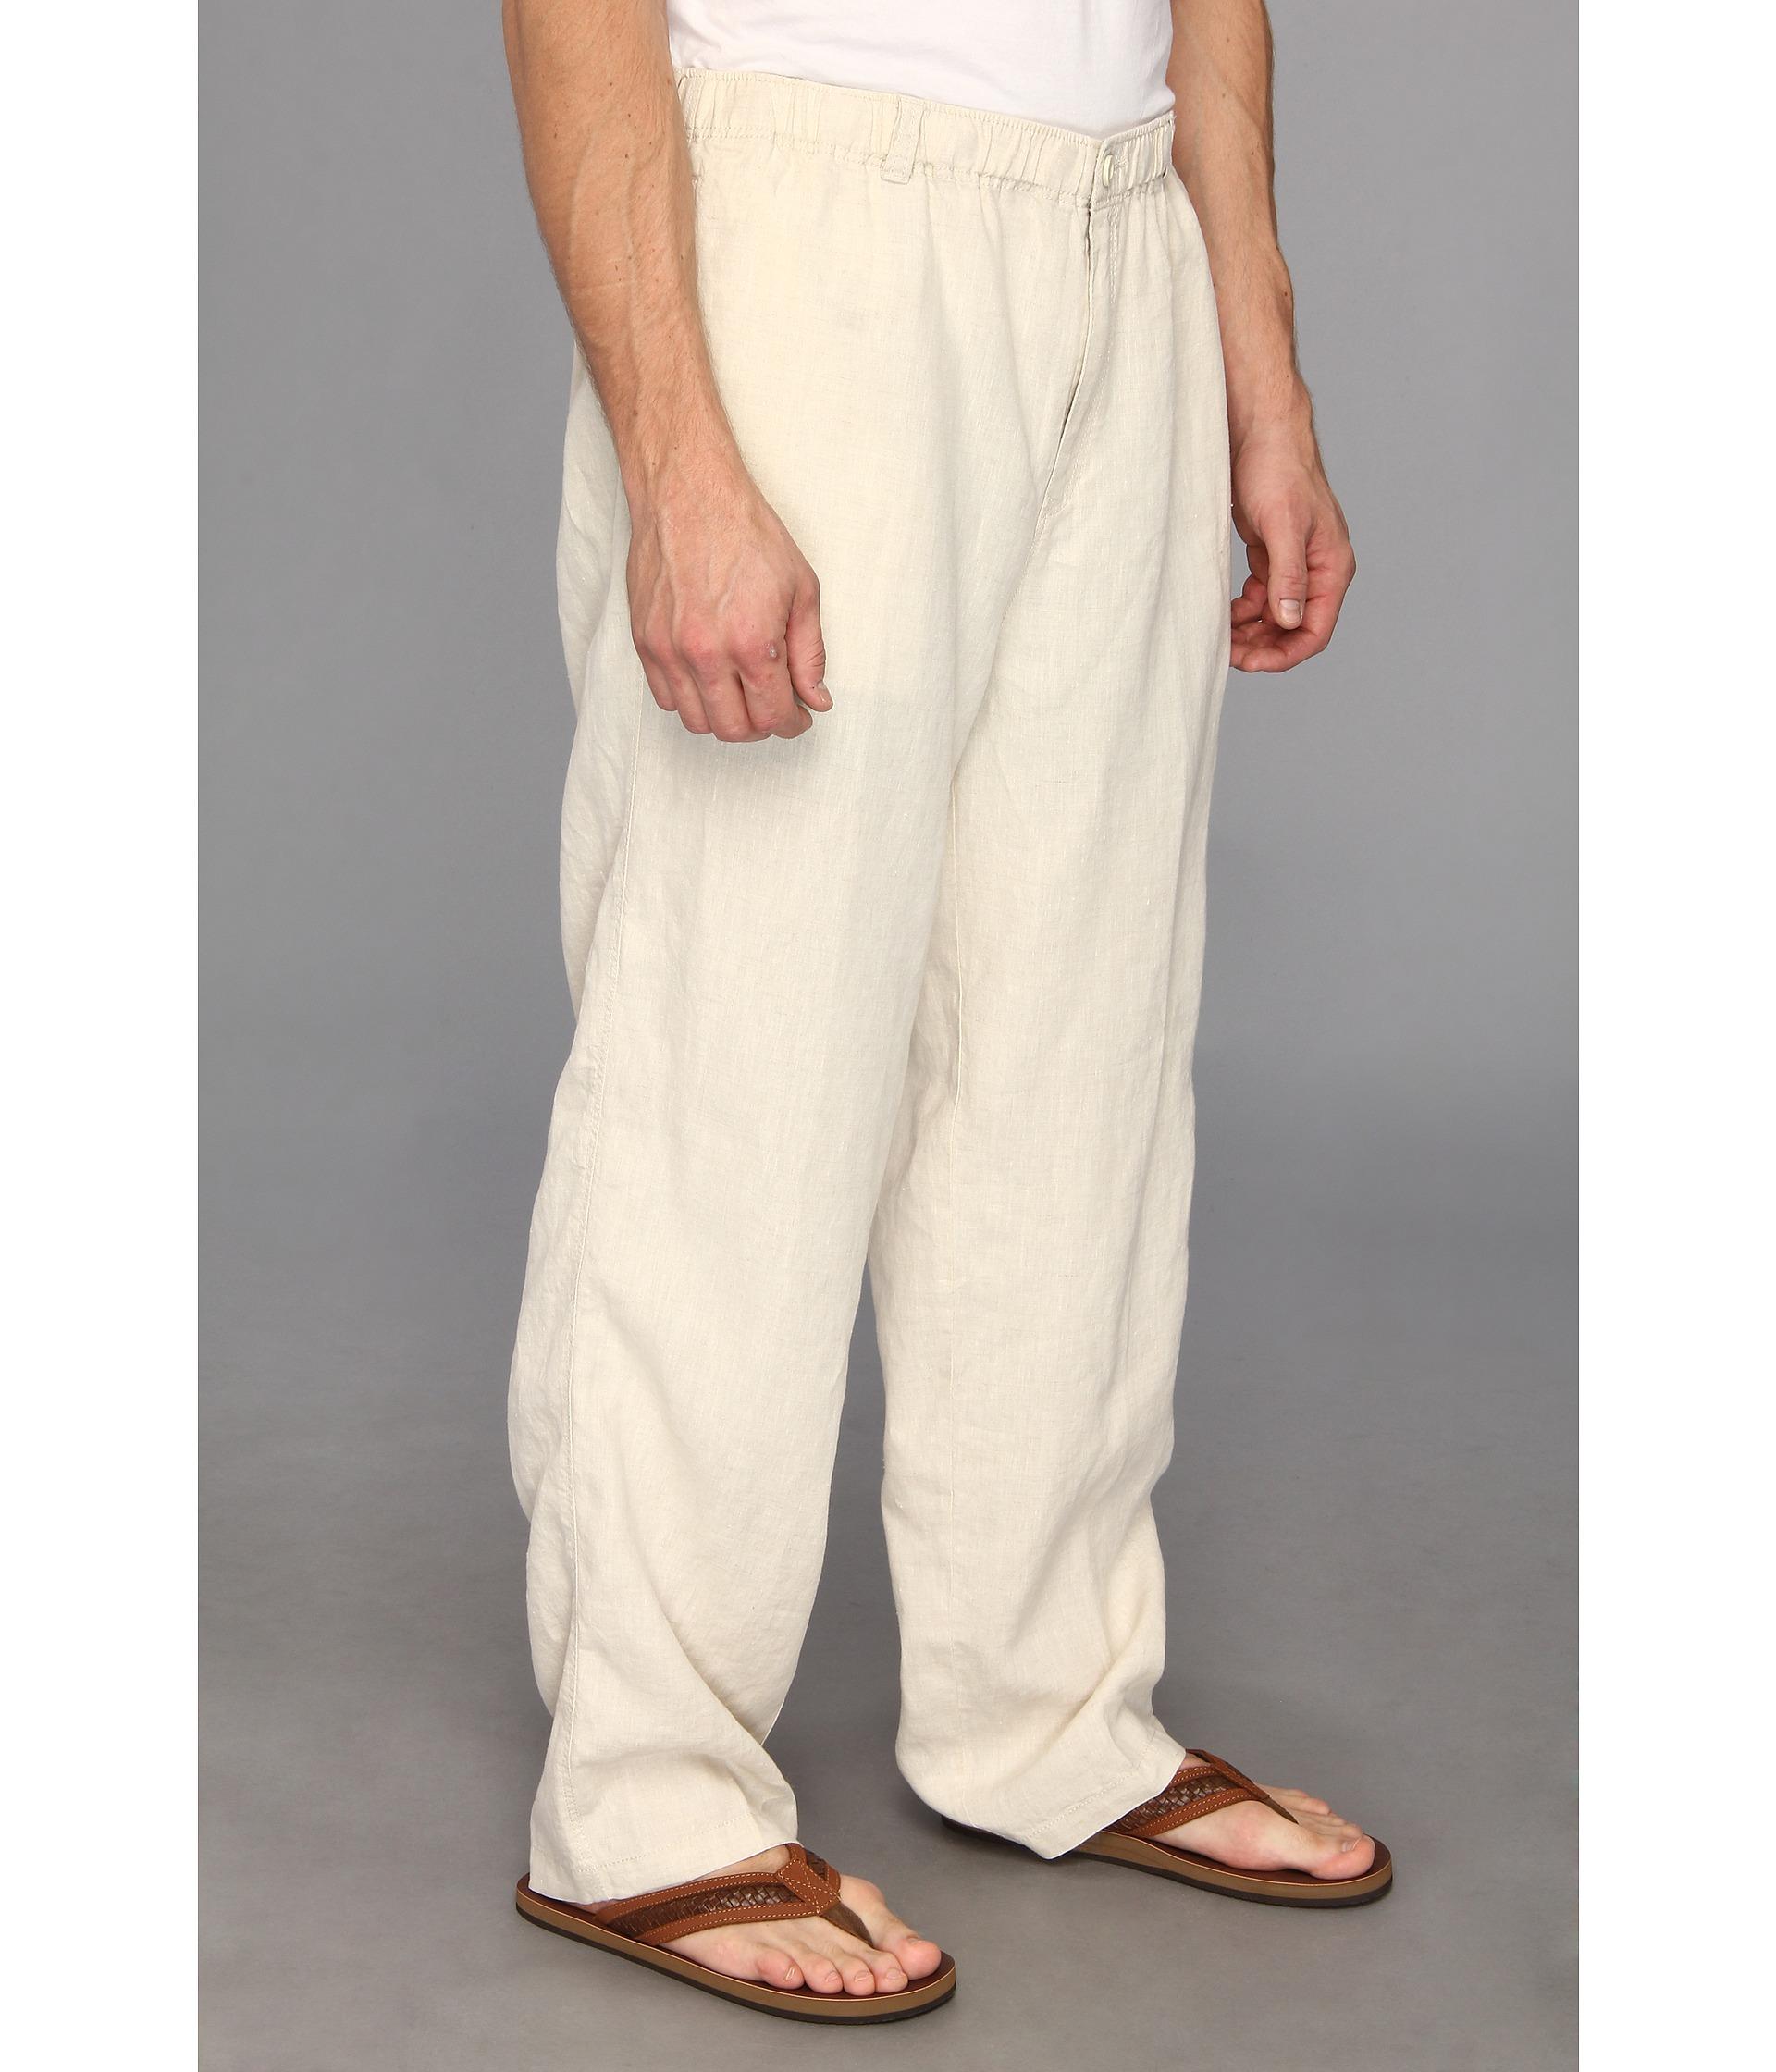 Popular Linen Pants For Women Beach Pants Womens Linen Pants Island Company